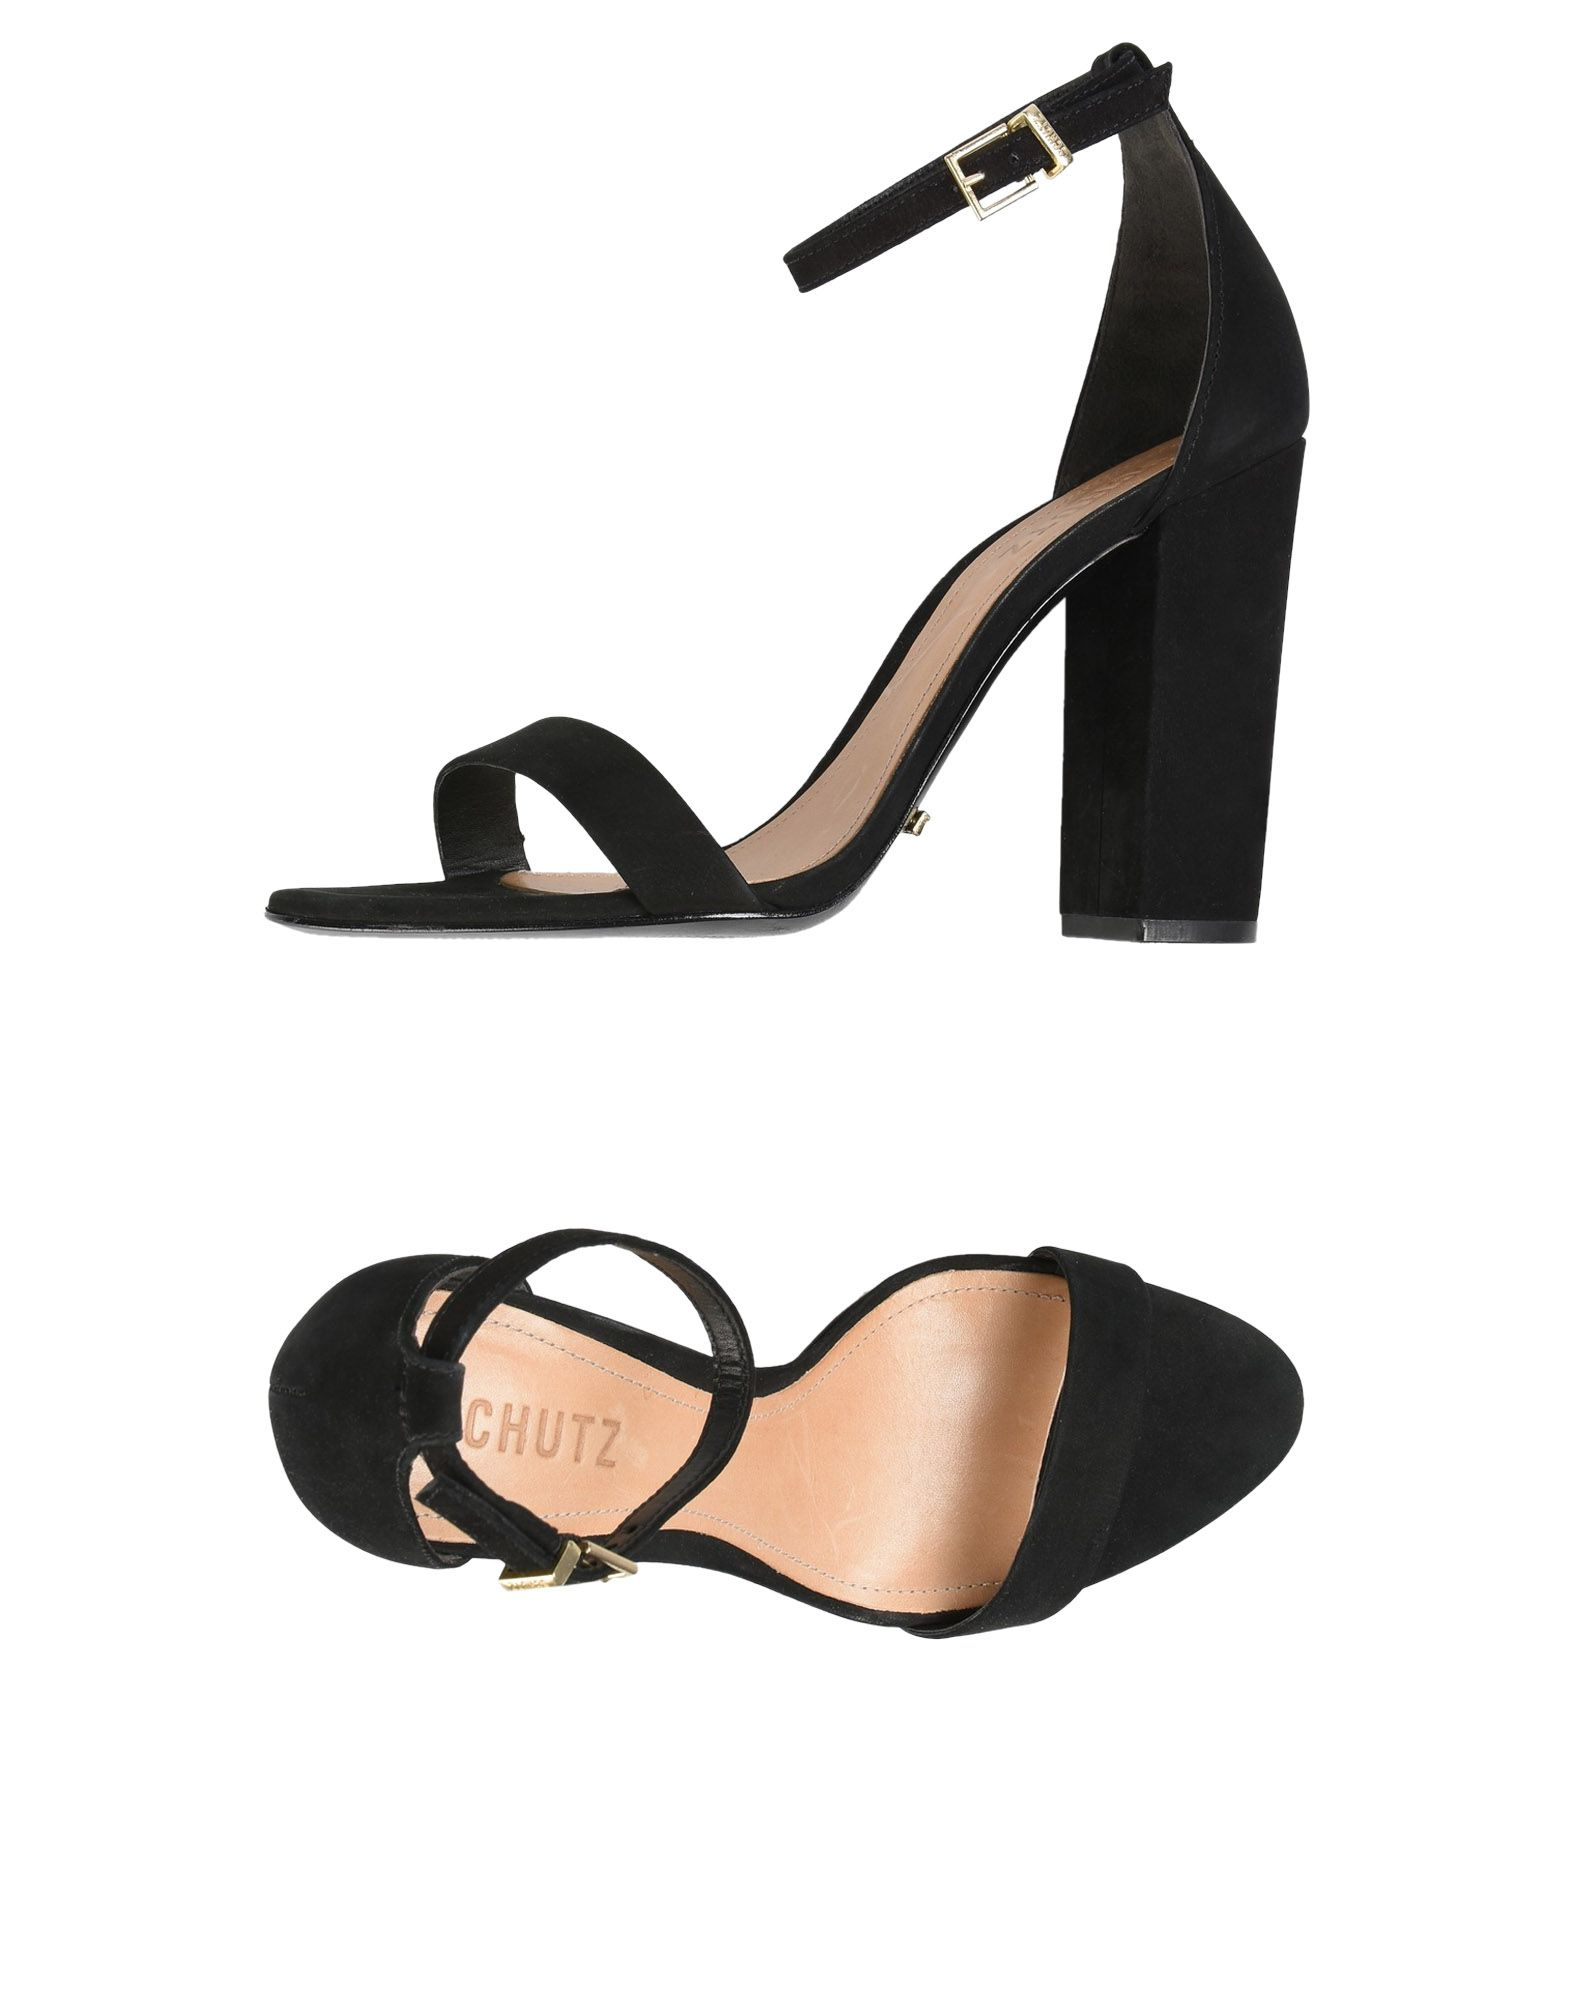 Schutz Sandalen Damen  11390817DH Gute Qualität beliebte Schuhe